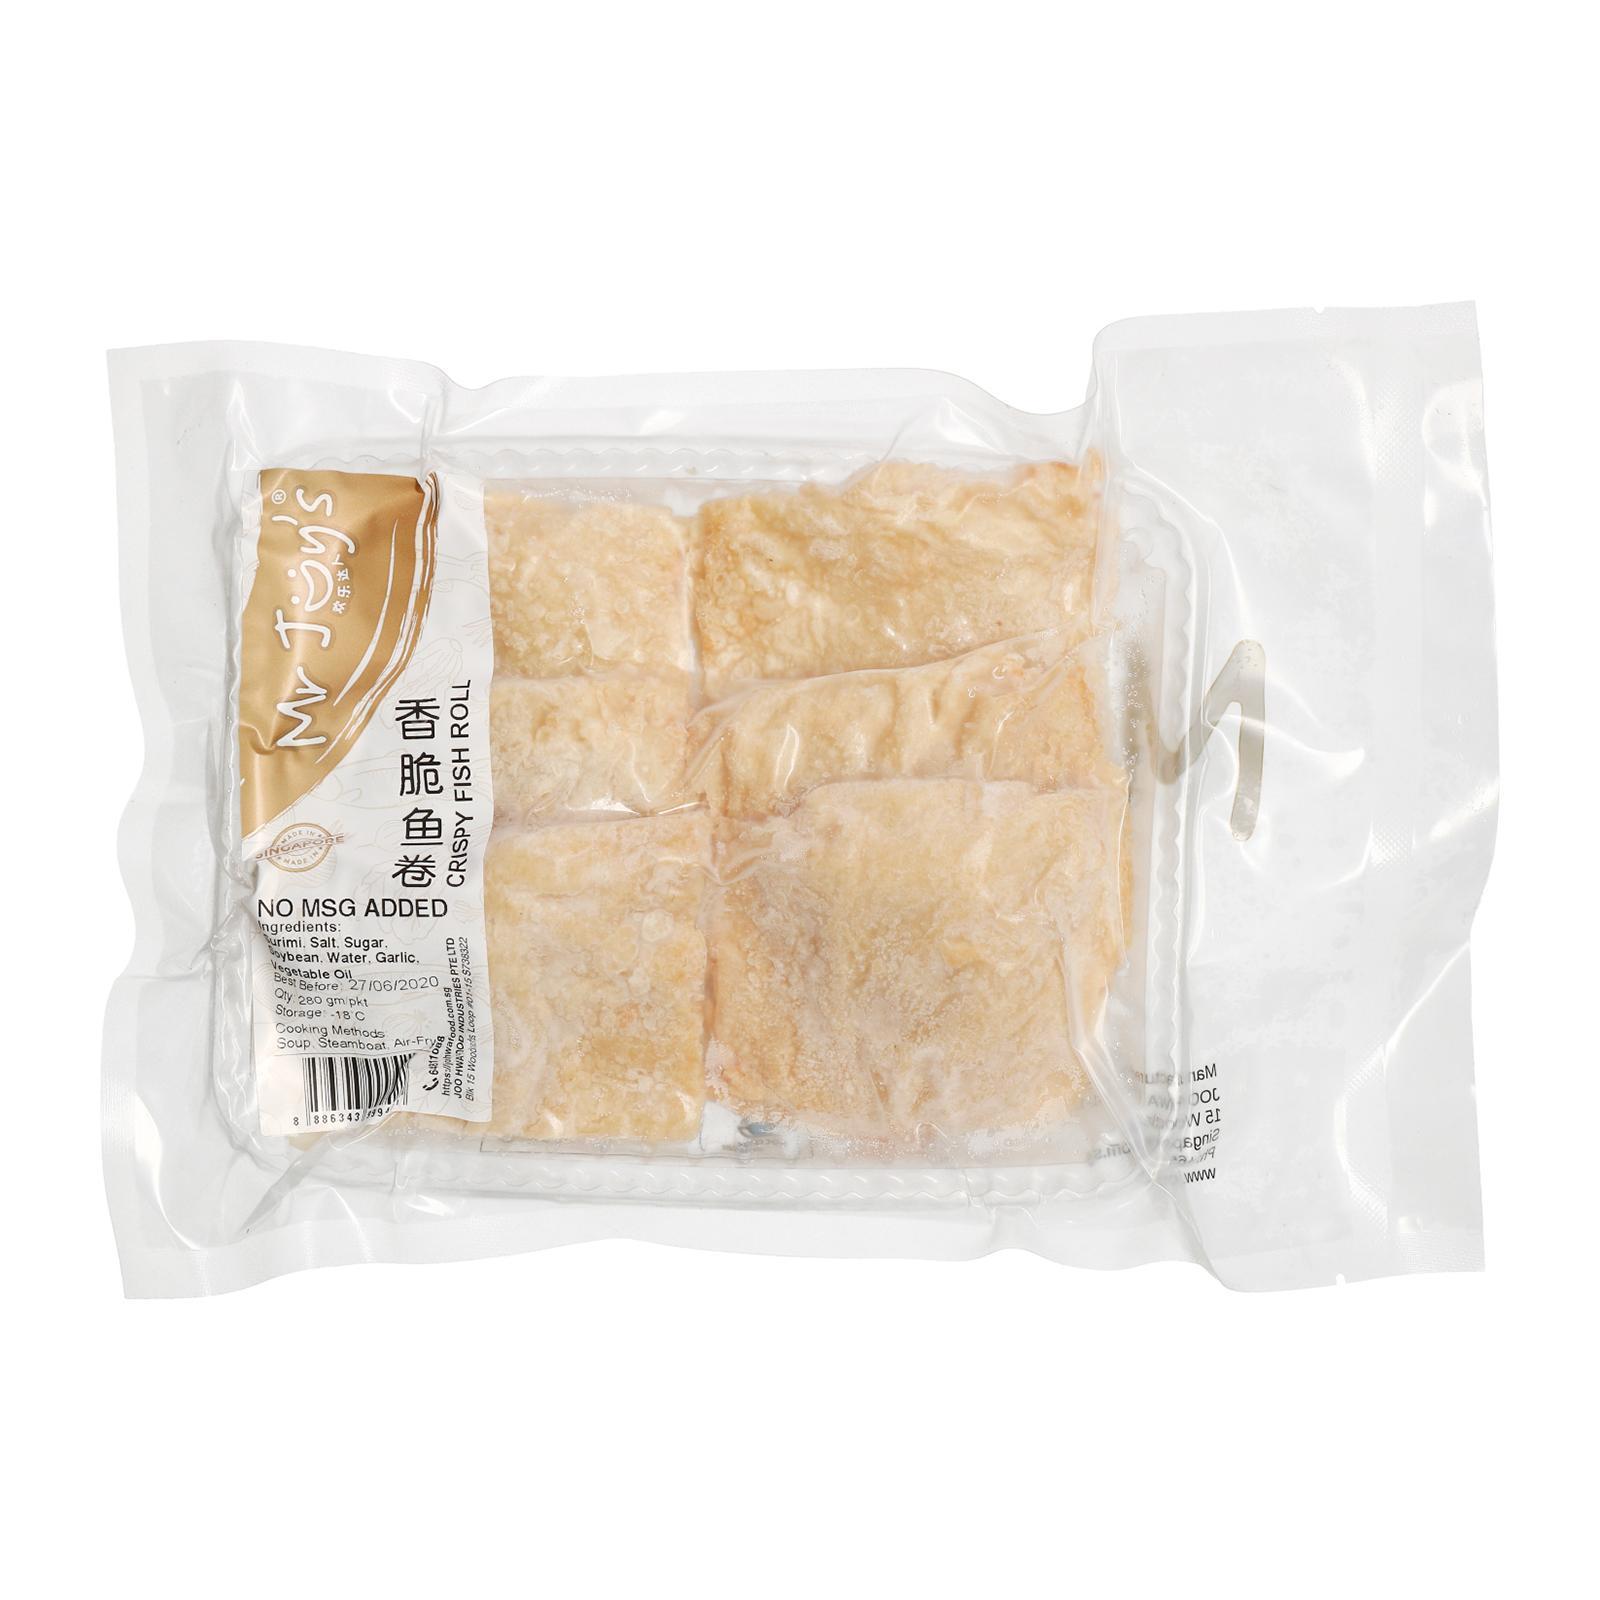 JHF Yong Tau Foo Crispy Fish Roll Non MSG - Frozen